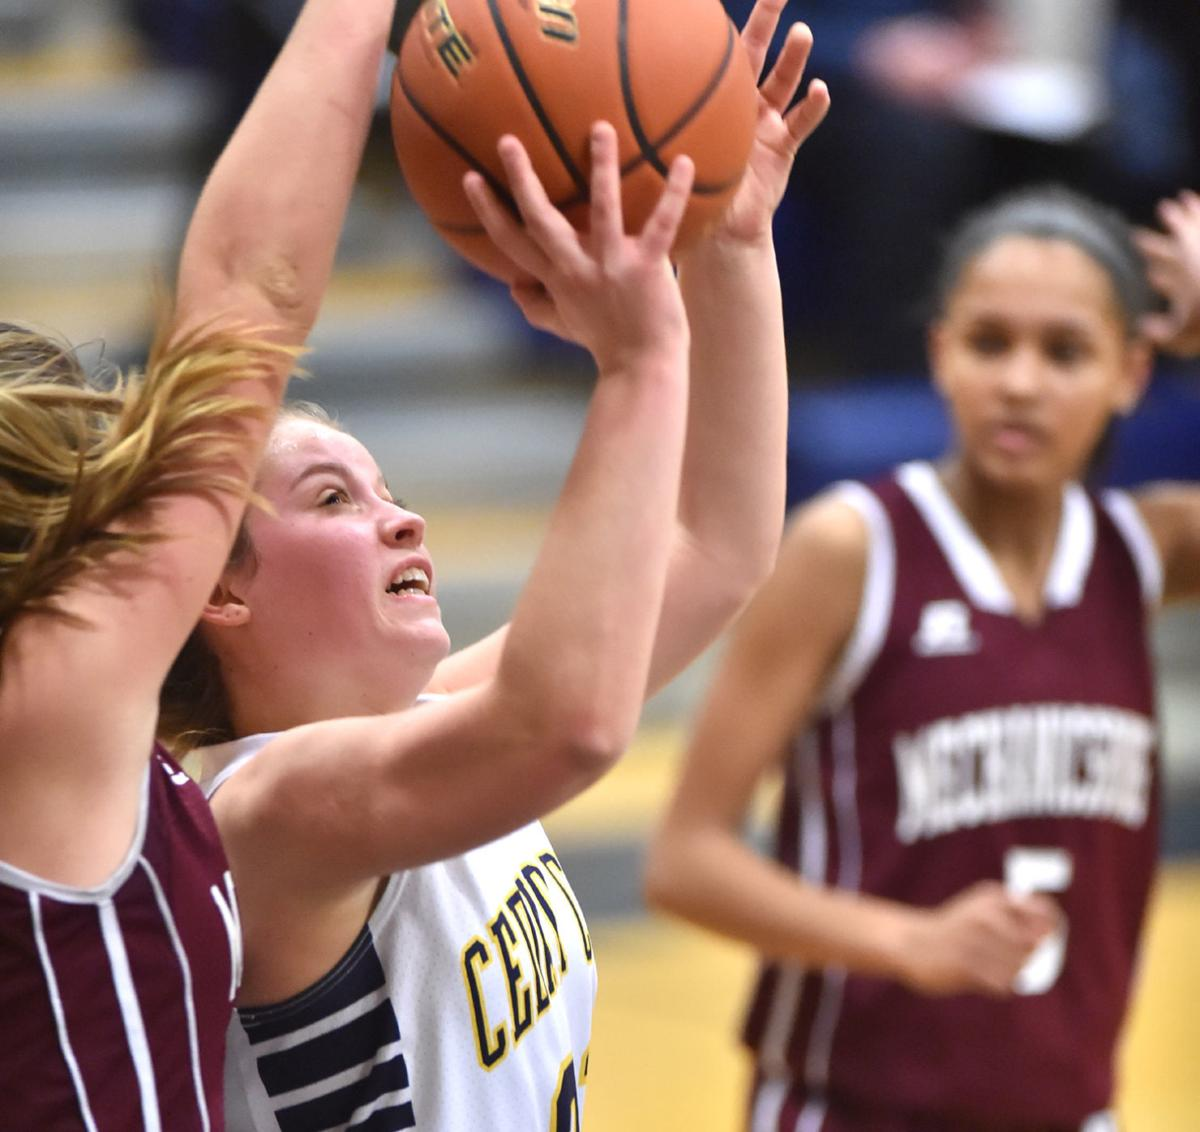 Girls Basketball Mechanicsburg at Cedar Cliff Jan 17, 2018 (copy)